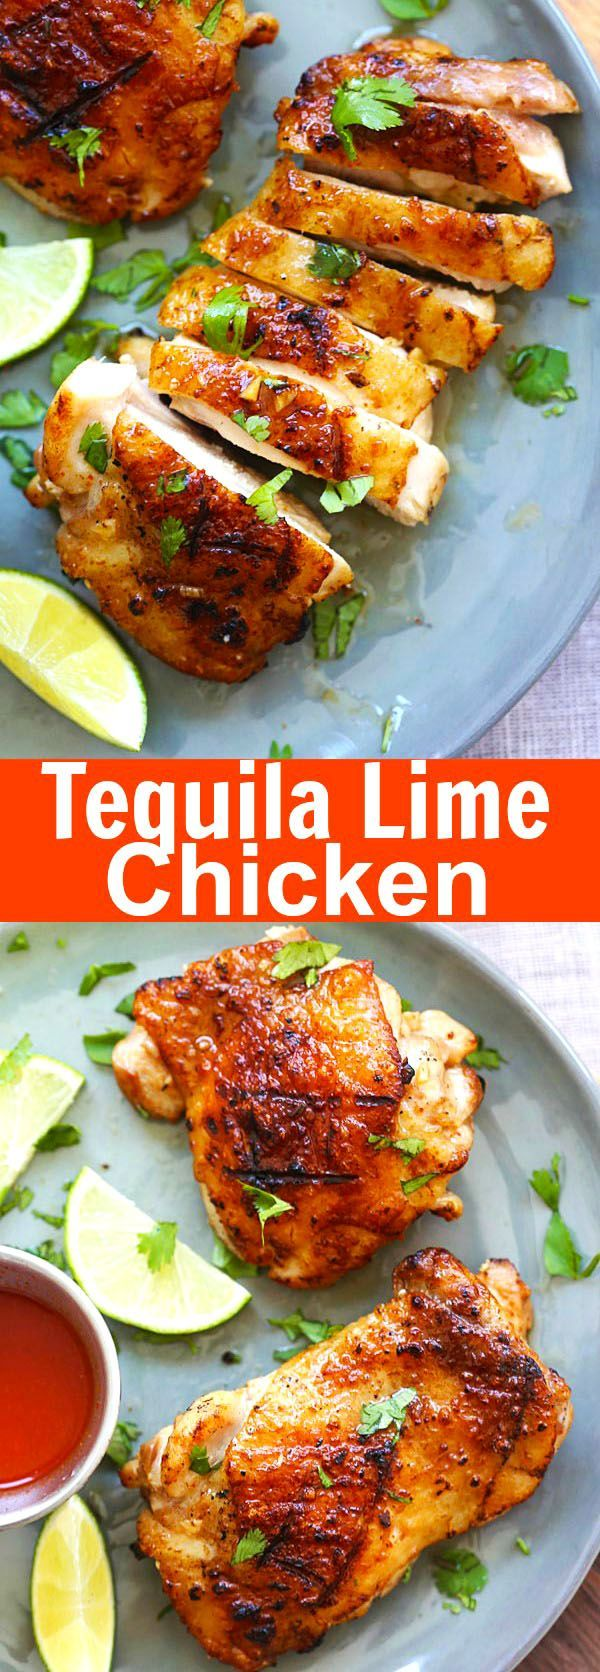 Tequila Lime Chicken – amazing chicken marinated with tequila, lime and garlic. This tequila lime chicken recipe tastes better than restaurant's | rasamalaysia.com